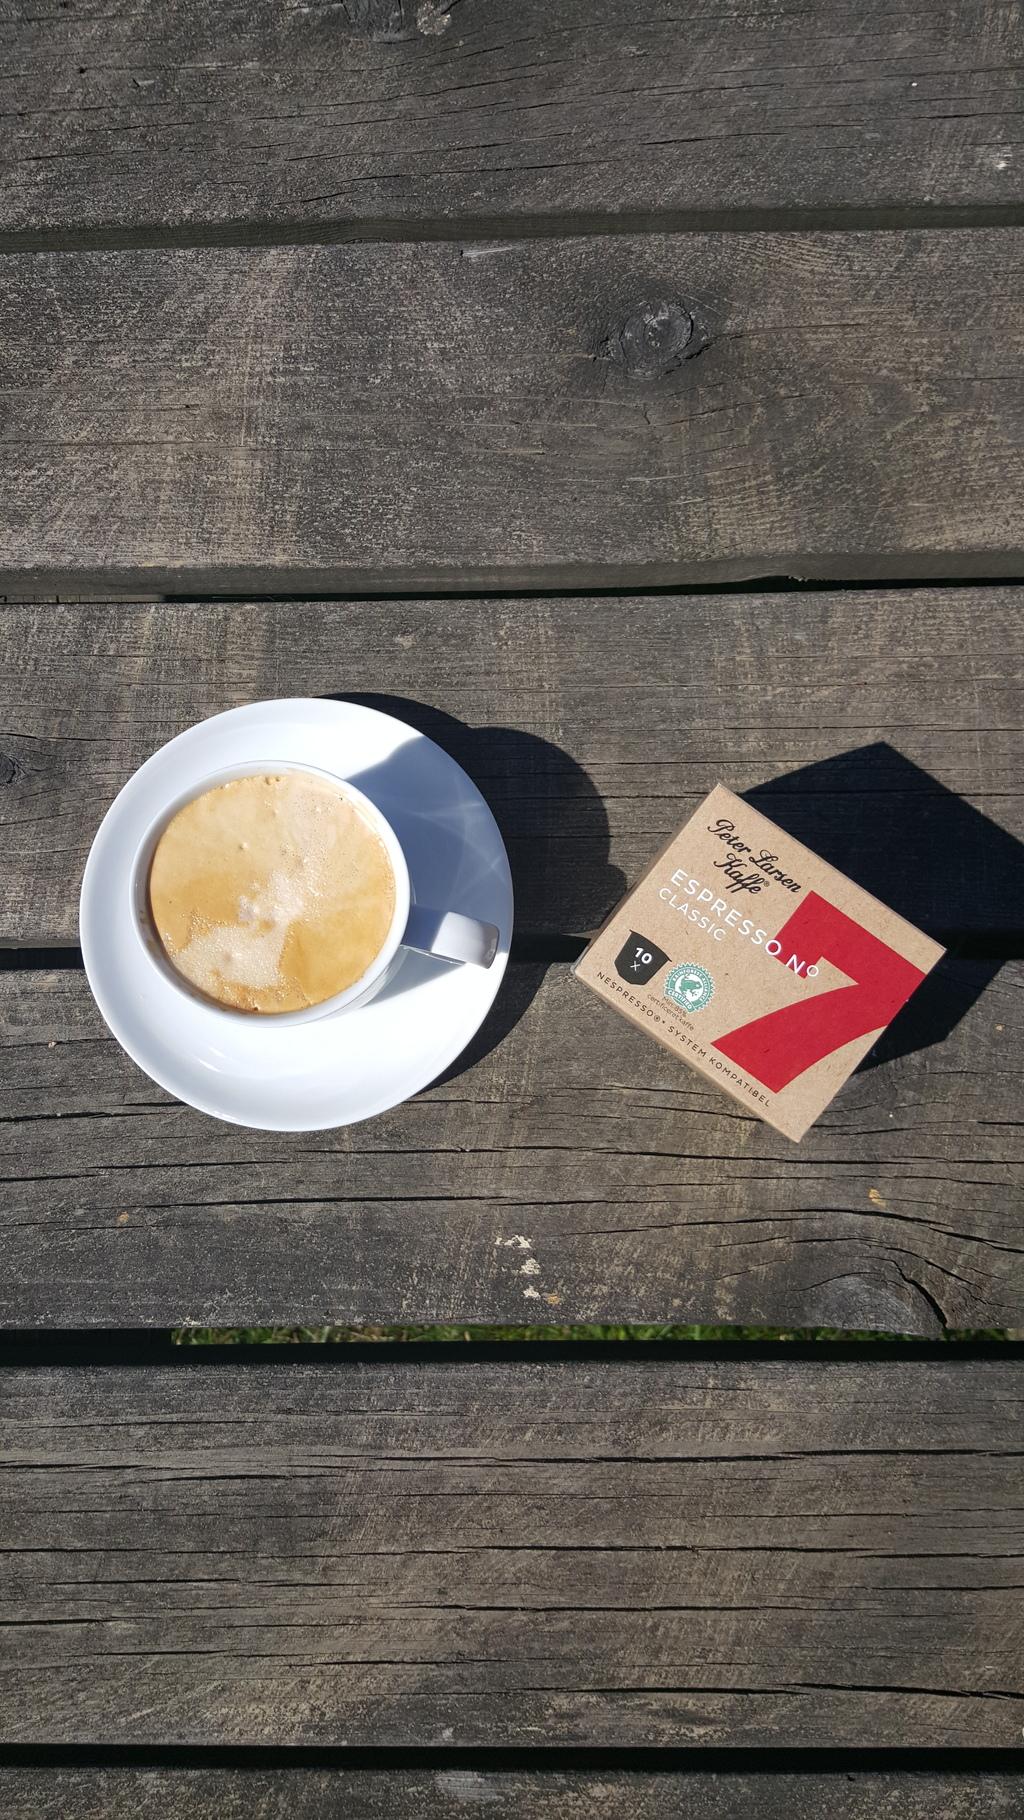 kolonihave peter larsen bionedbrydelige kaffekapsler nespresso